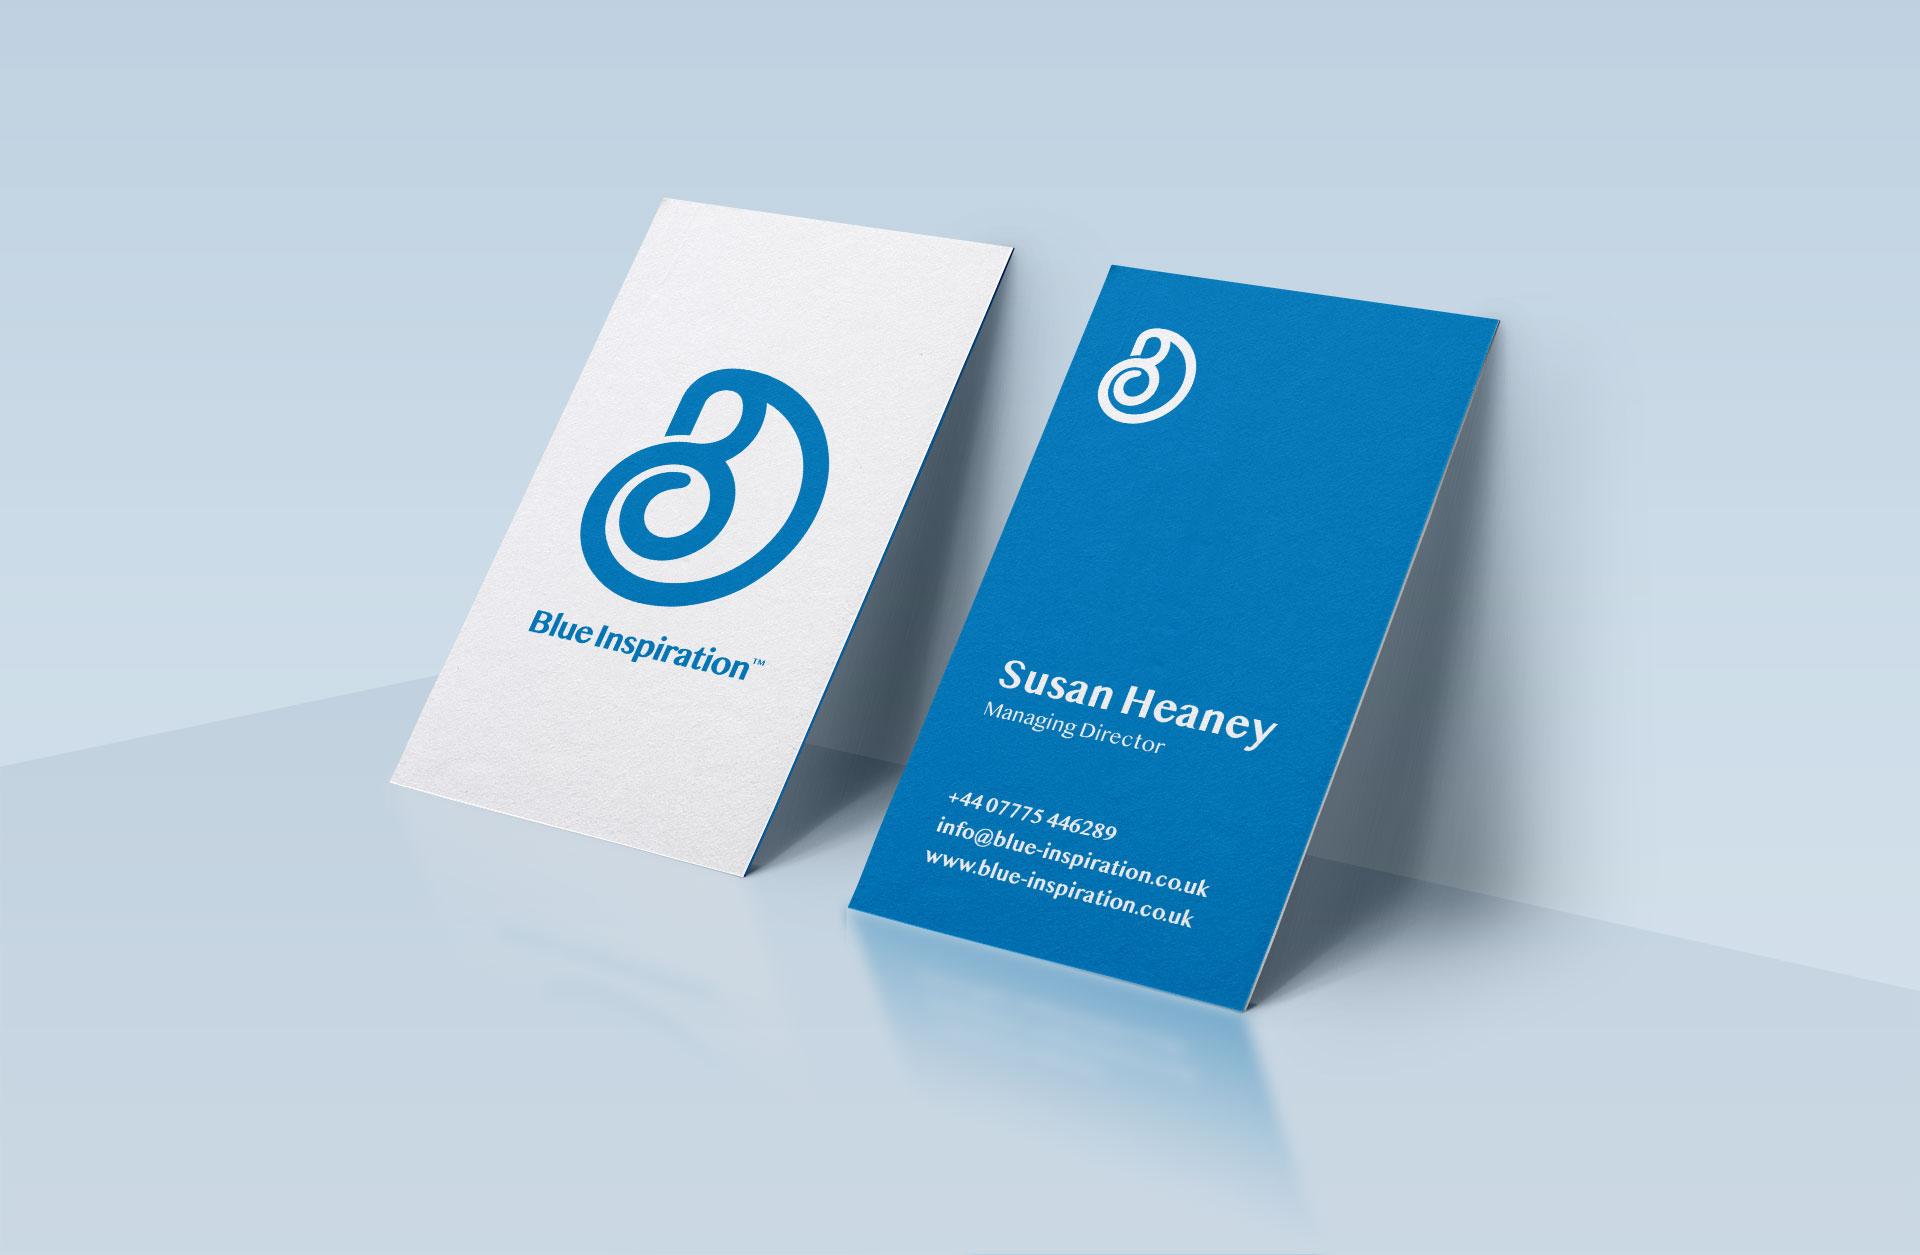 Blue Inspiration - Science Logo Design on Business Card